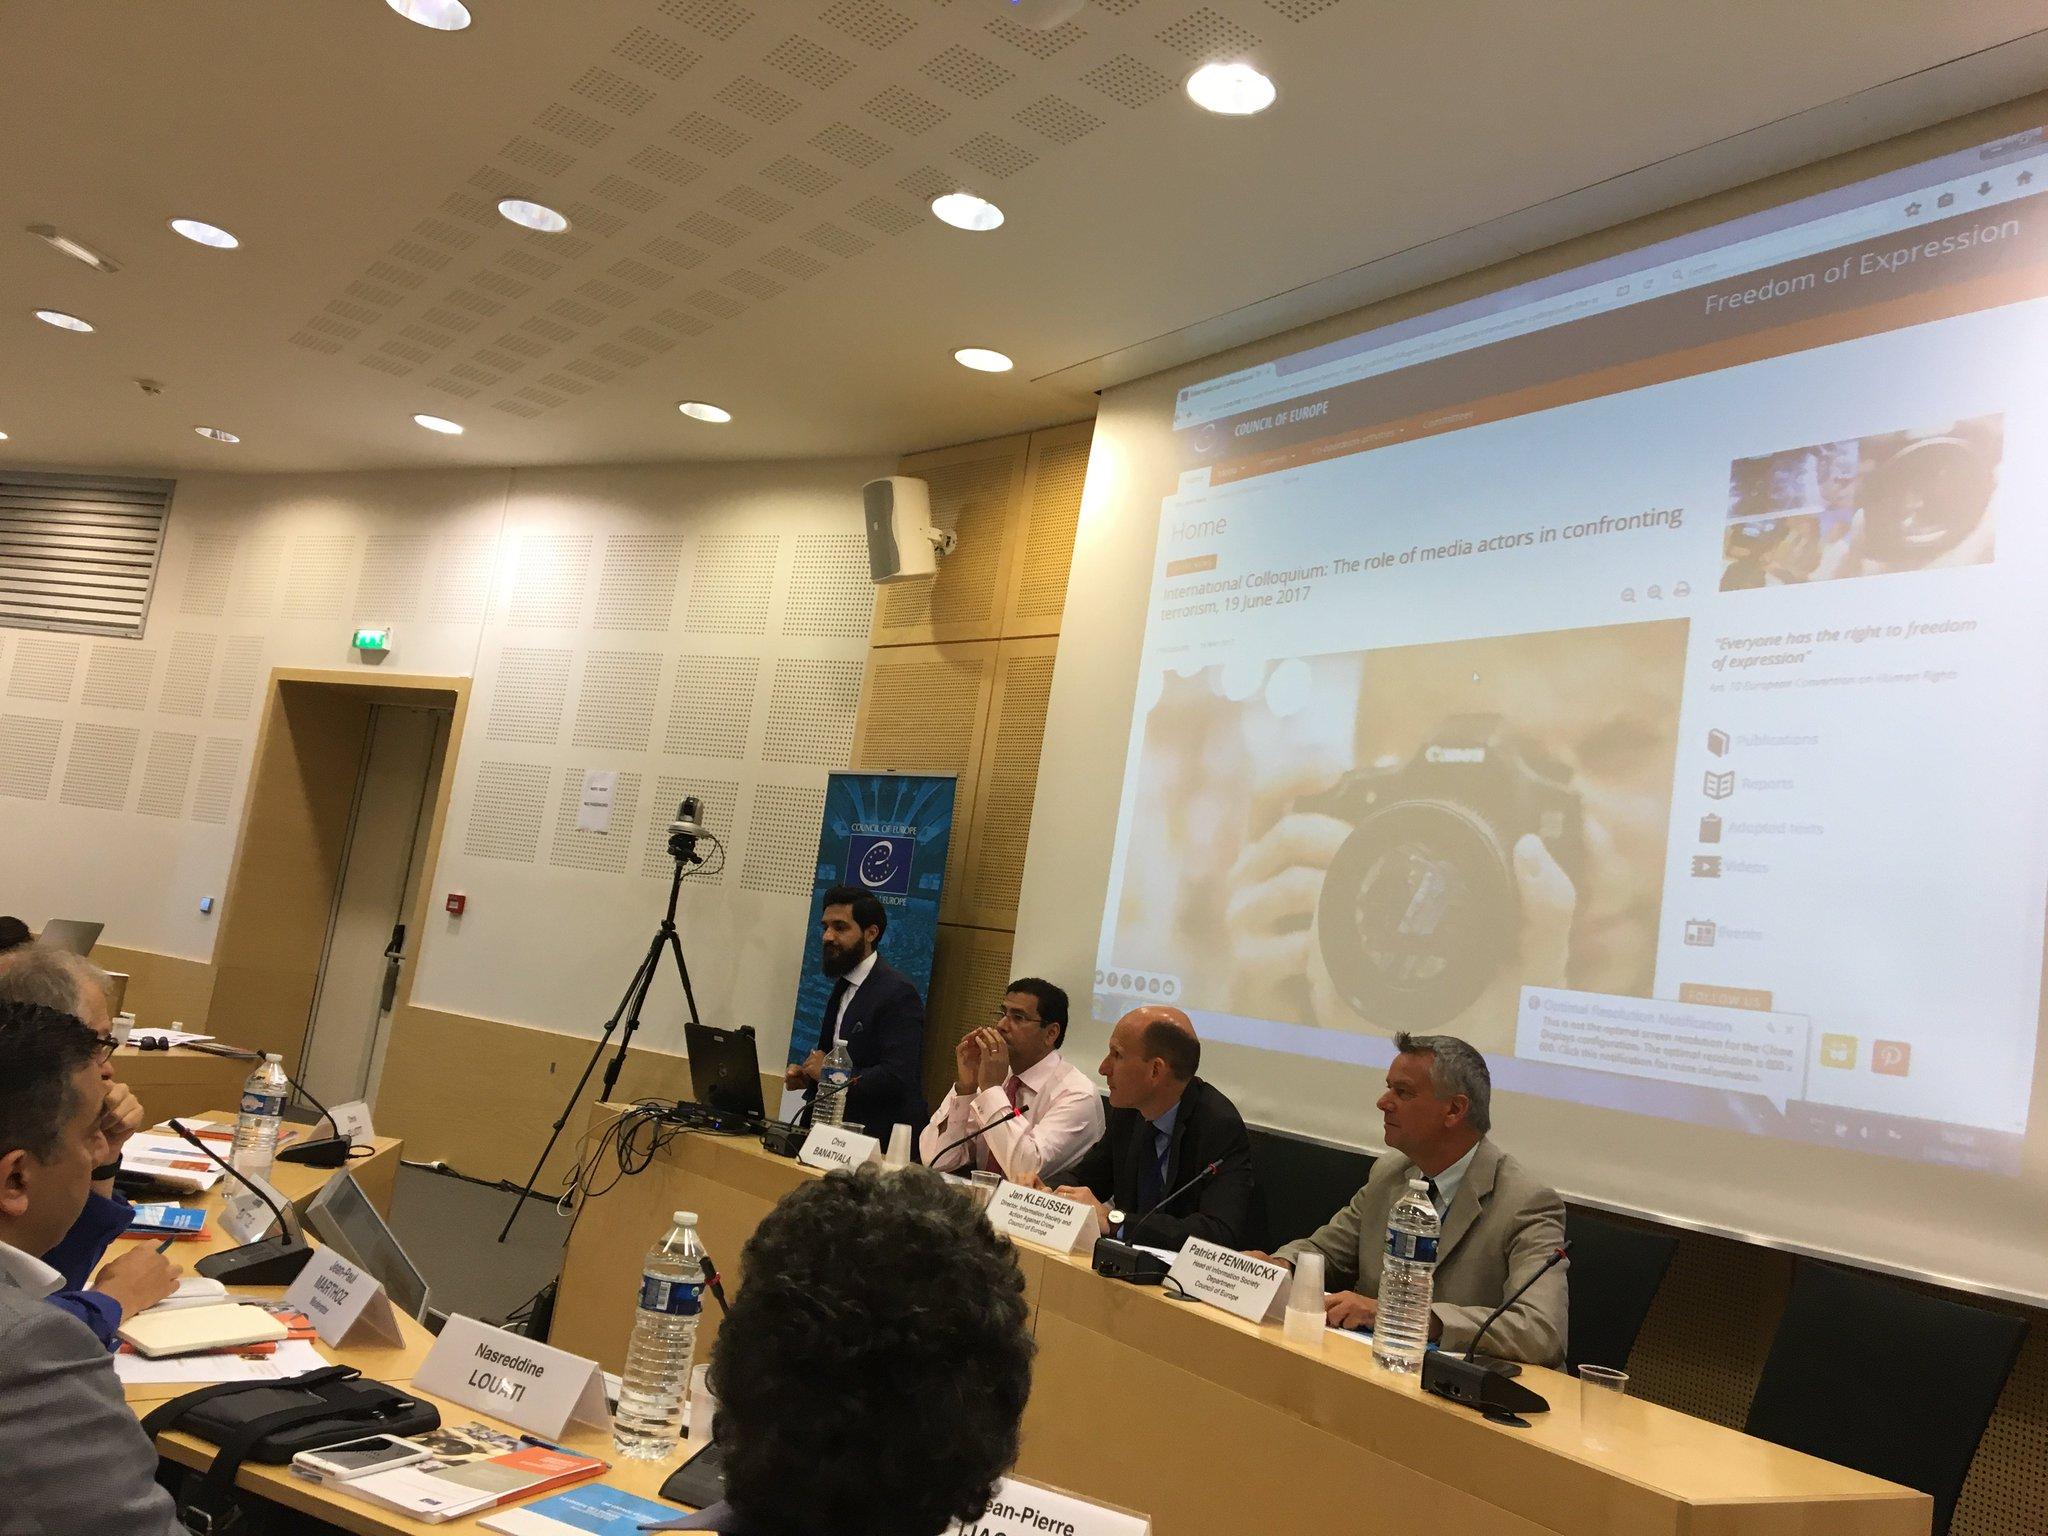 .@JKleijssen opens @coe colloquium on the role of media actors in confronting #terrorism https://t.co/RArVIrJaLV #terror #mediaethics https://t.co/dyxnrGvMZK